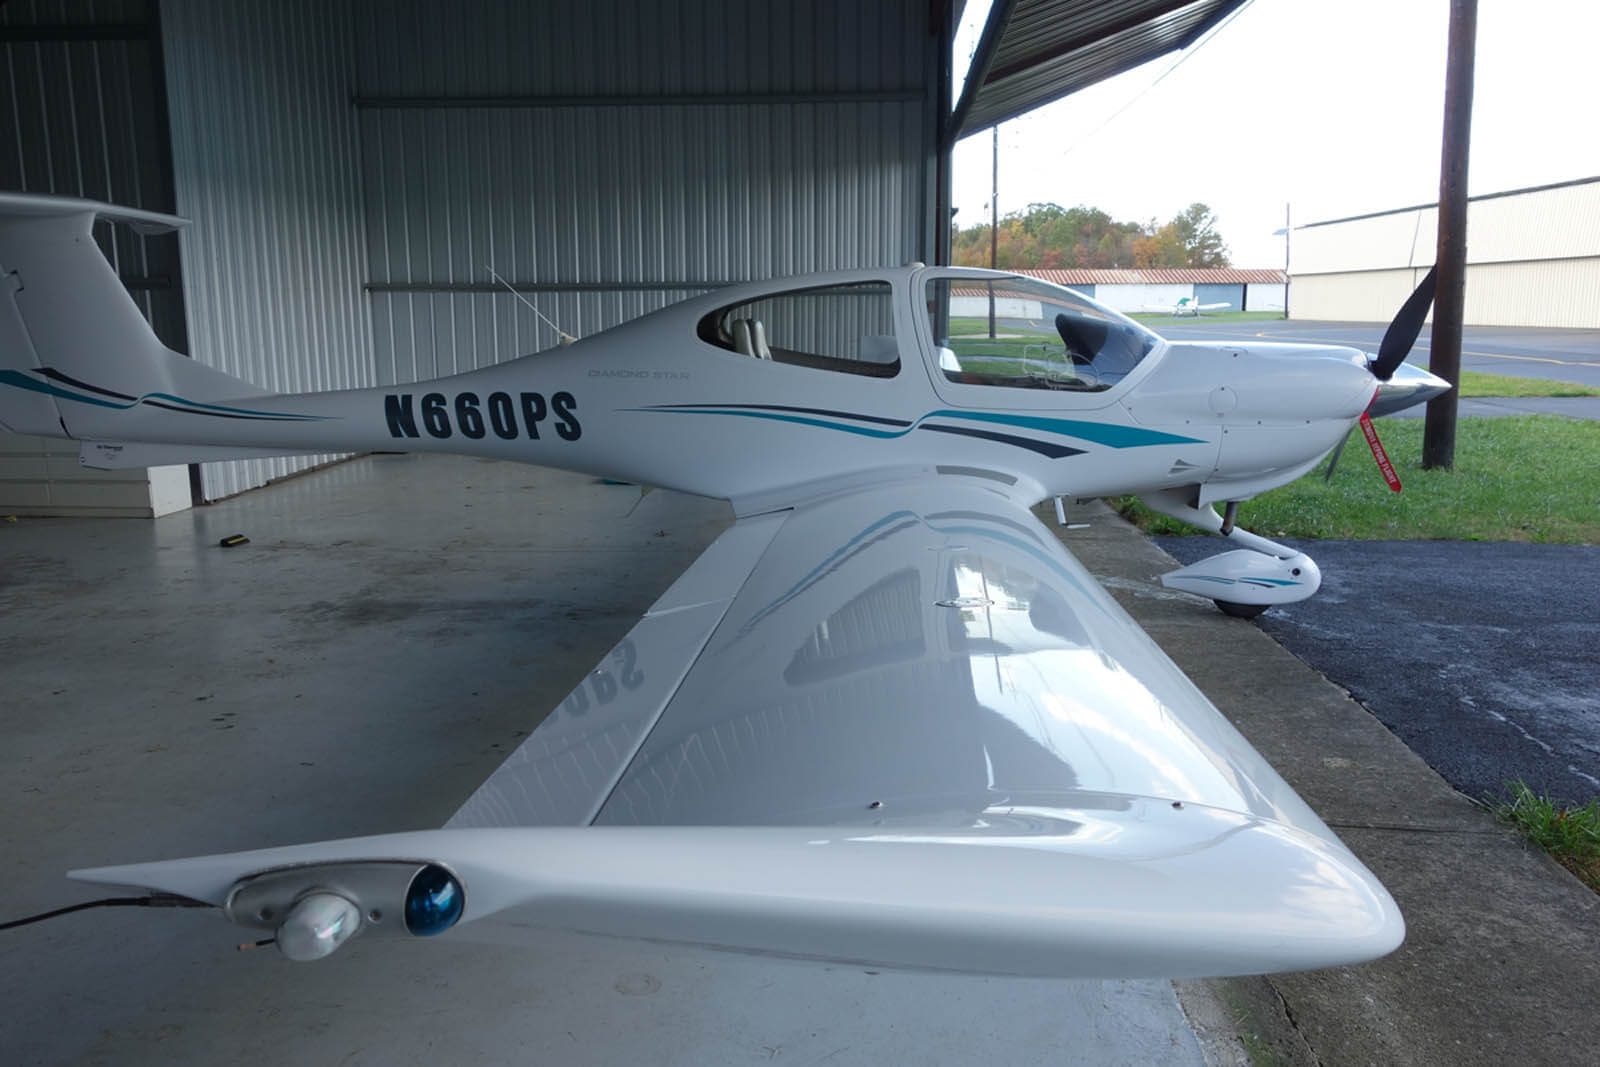 2006 Diamond DA40 – FOR SALE at Princeton Airport - Contact Ken Nierenberg at 609-731-4628